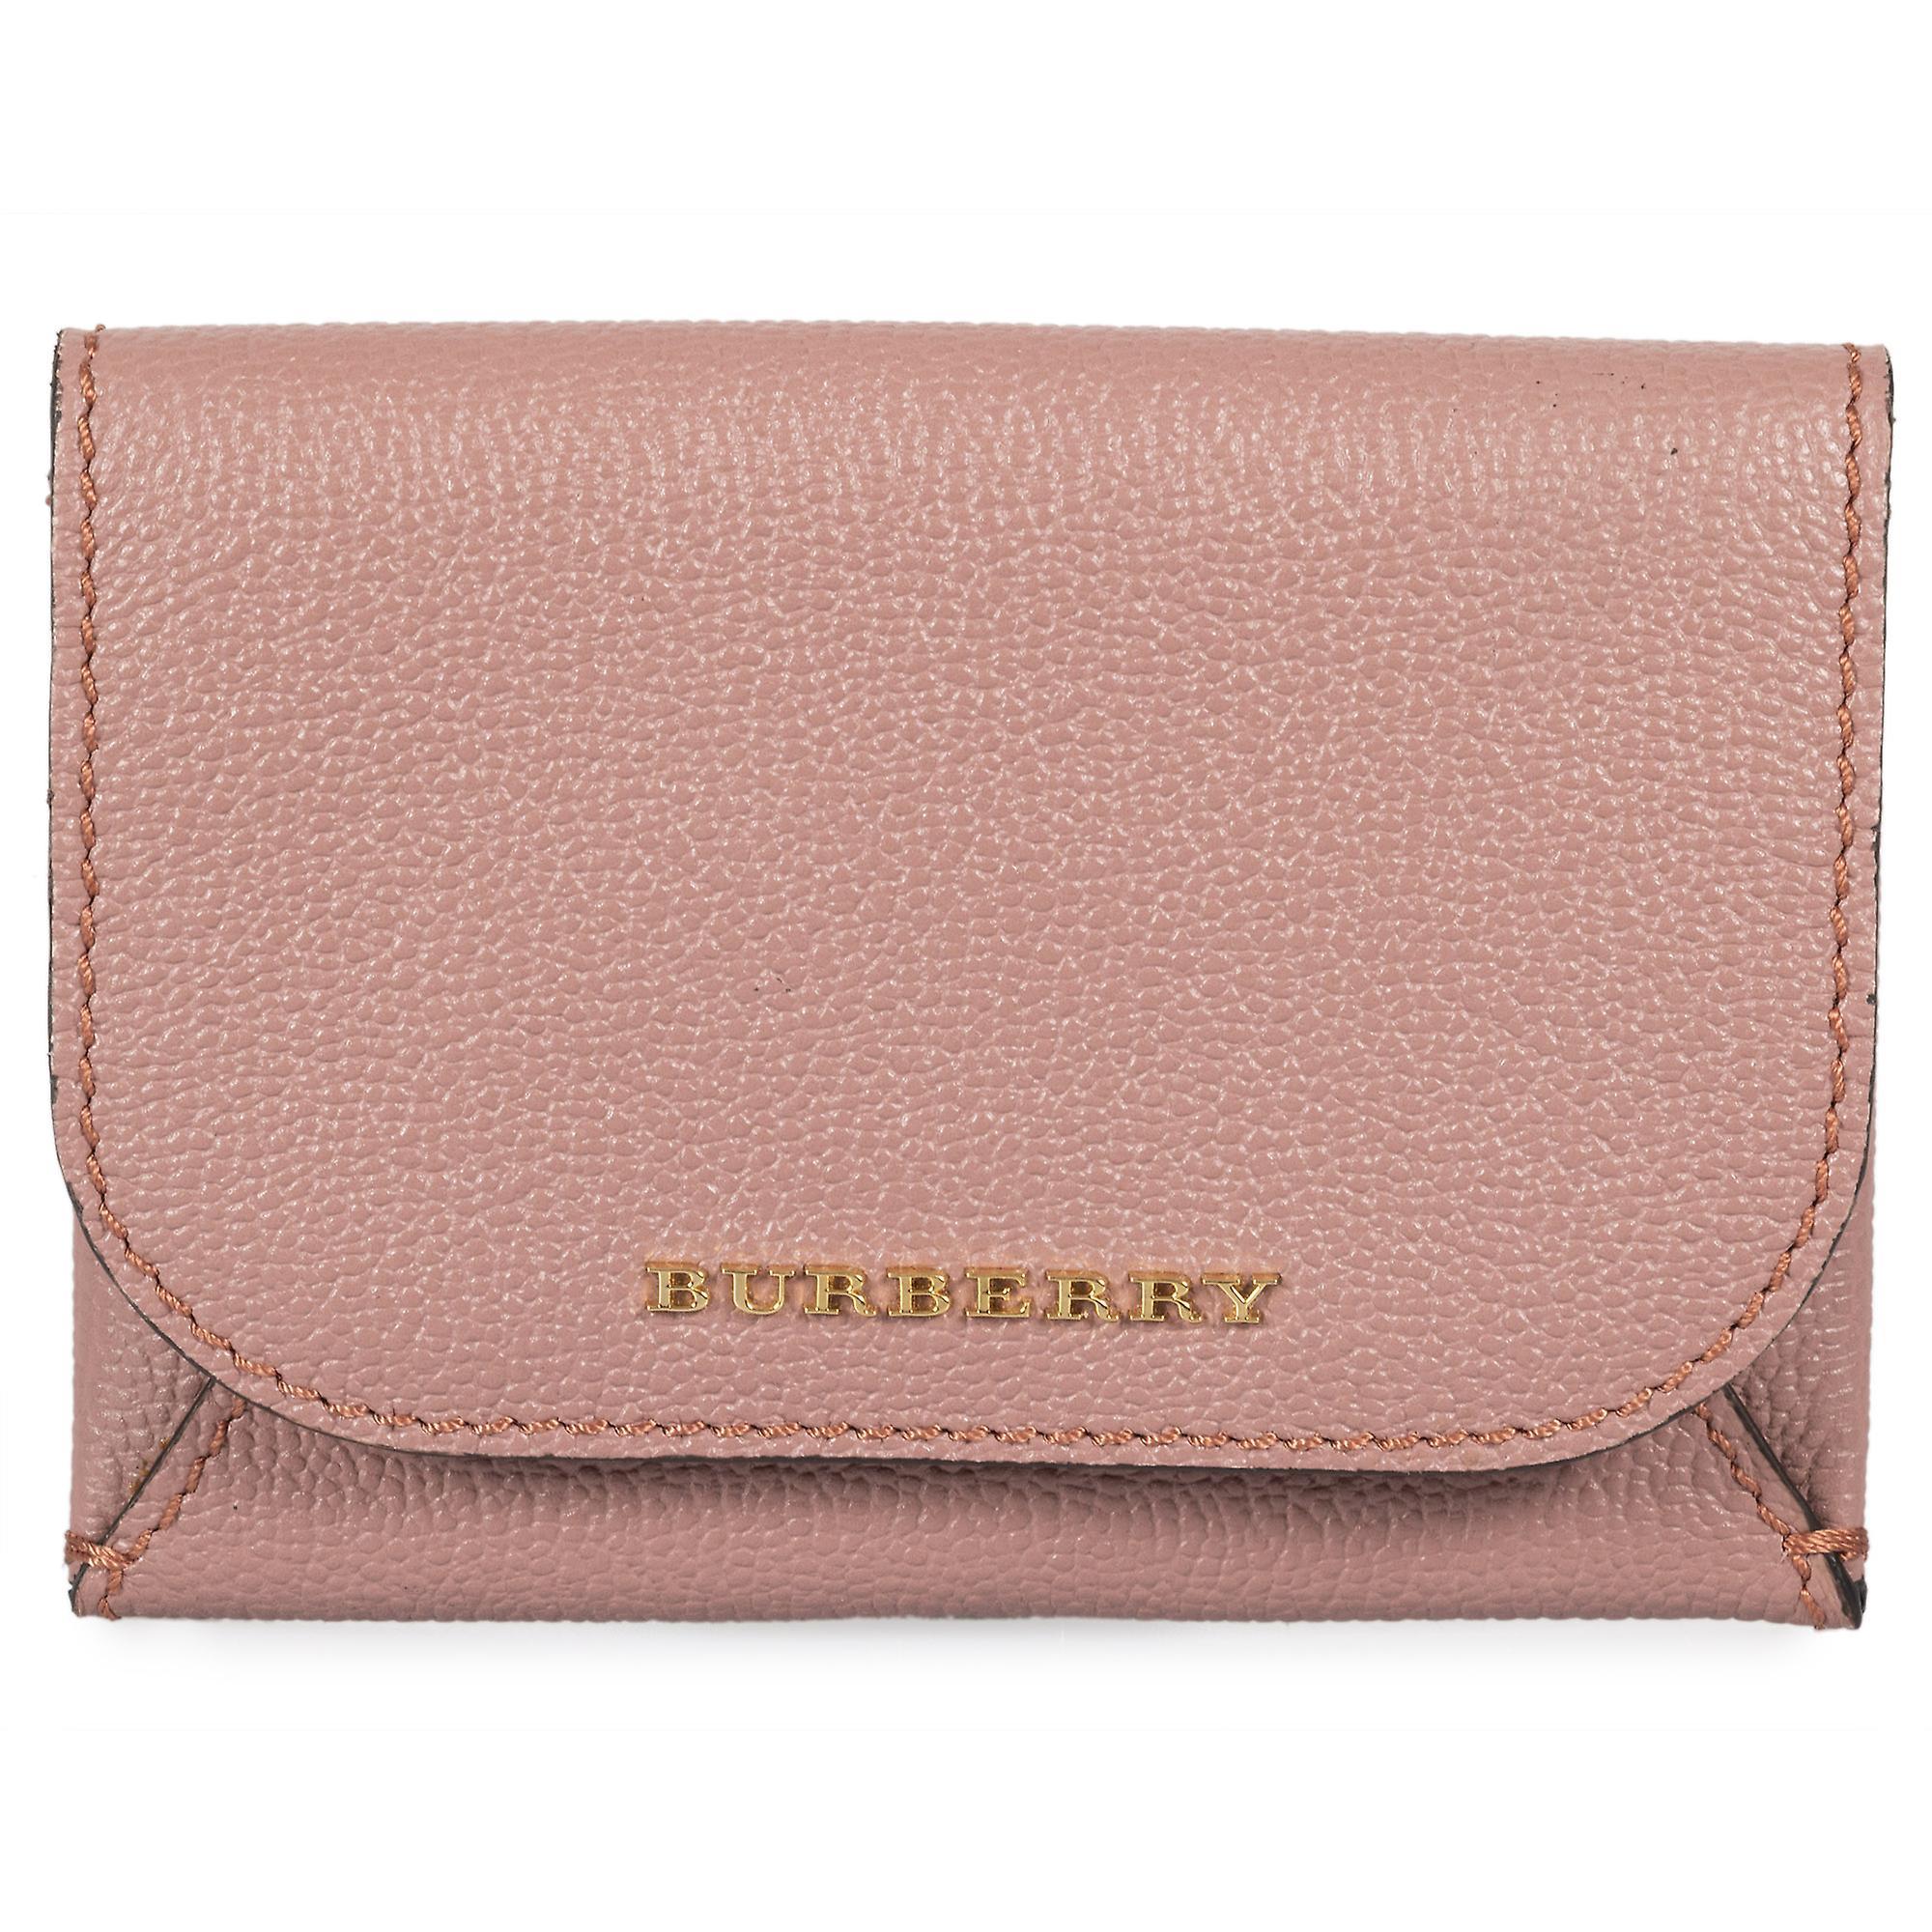 Burberry Haymarket Mayfield skinn kort veske i mørk rosa